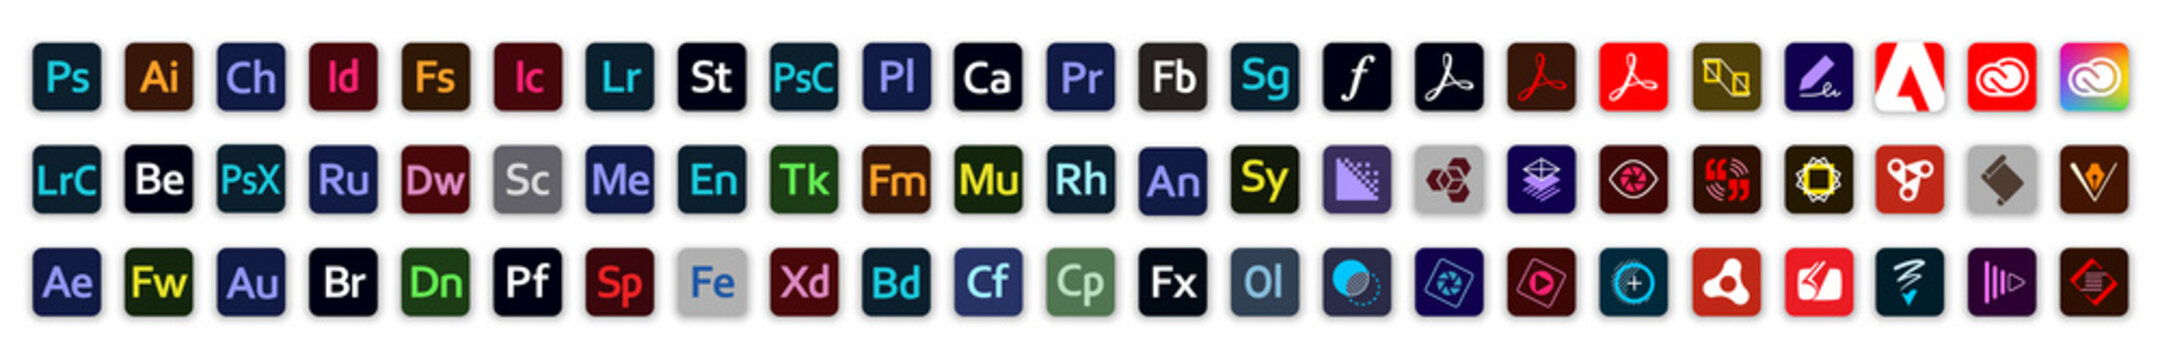 Kiev, Ukraine - October 31, 2020: Set button icons Adobe products: Photoshop, Illustrator, InDesign, Acrobat DC, Premiere Pro, Lightroom, After Effects, Dreamweaver, Creative Cloud. Editorial vector.